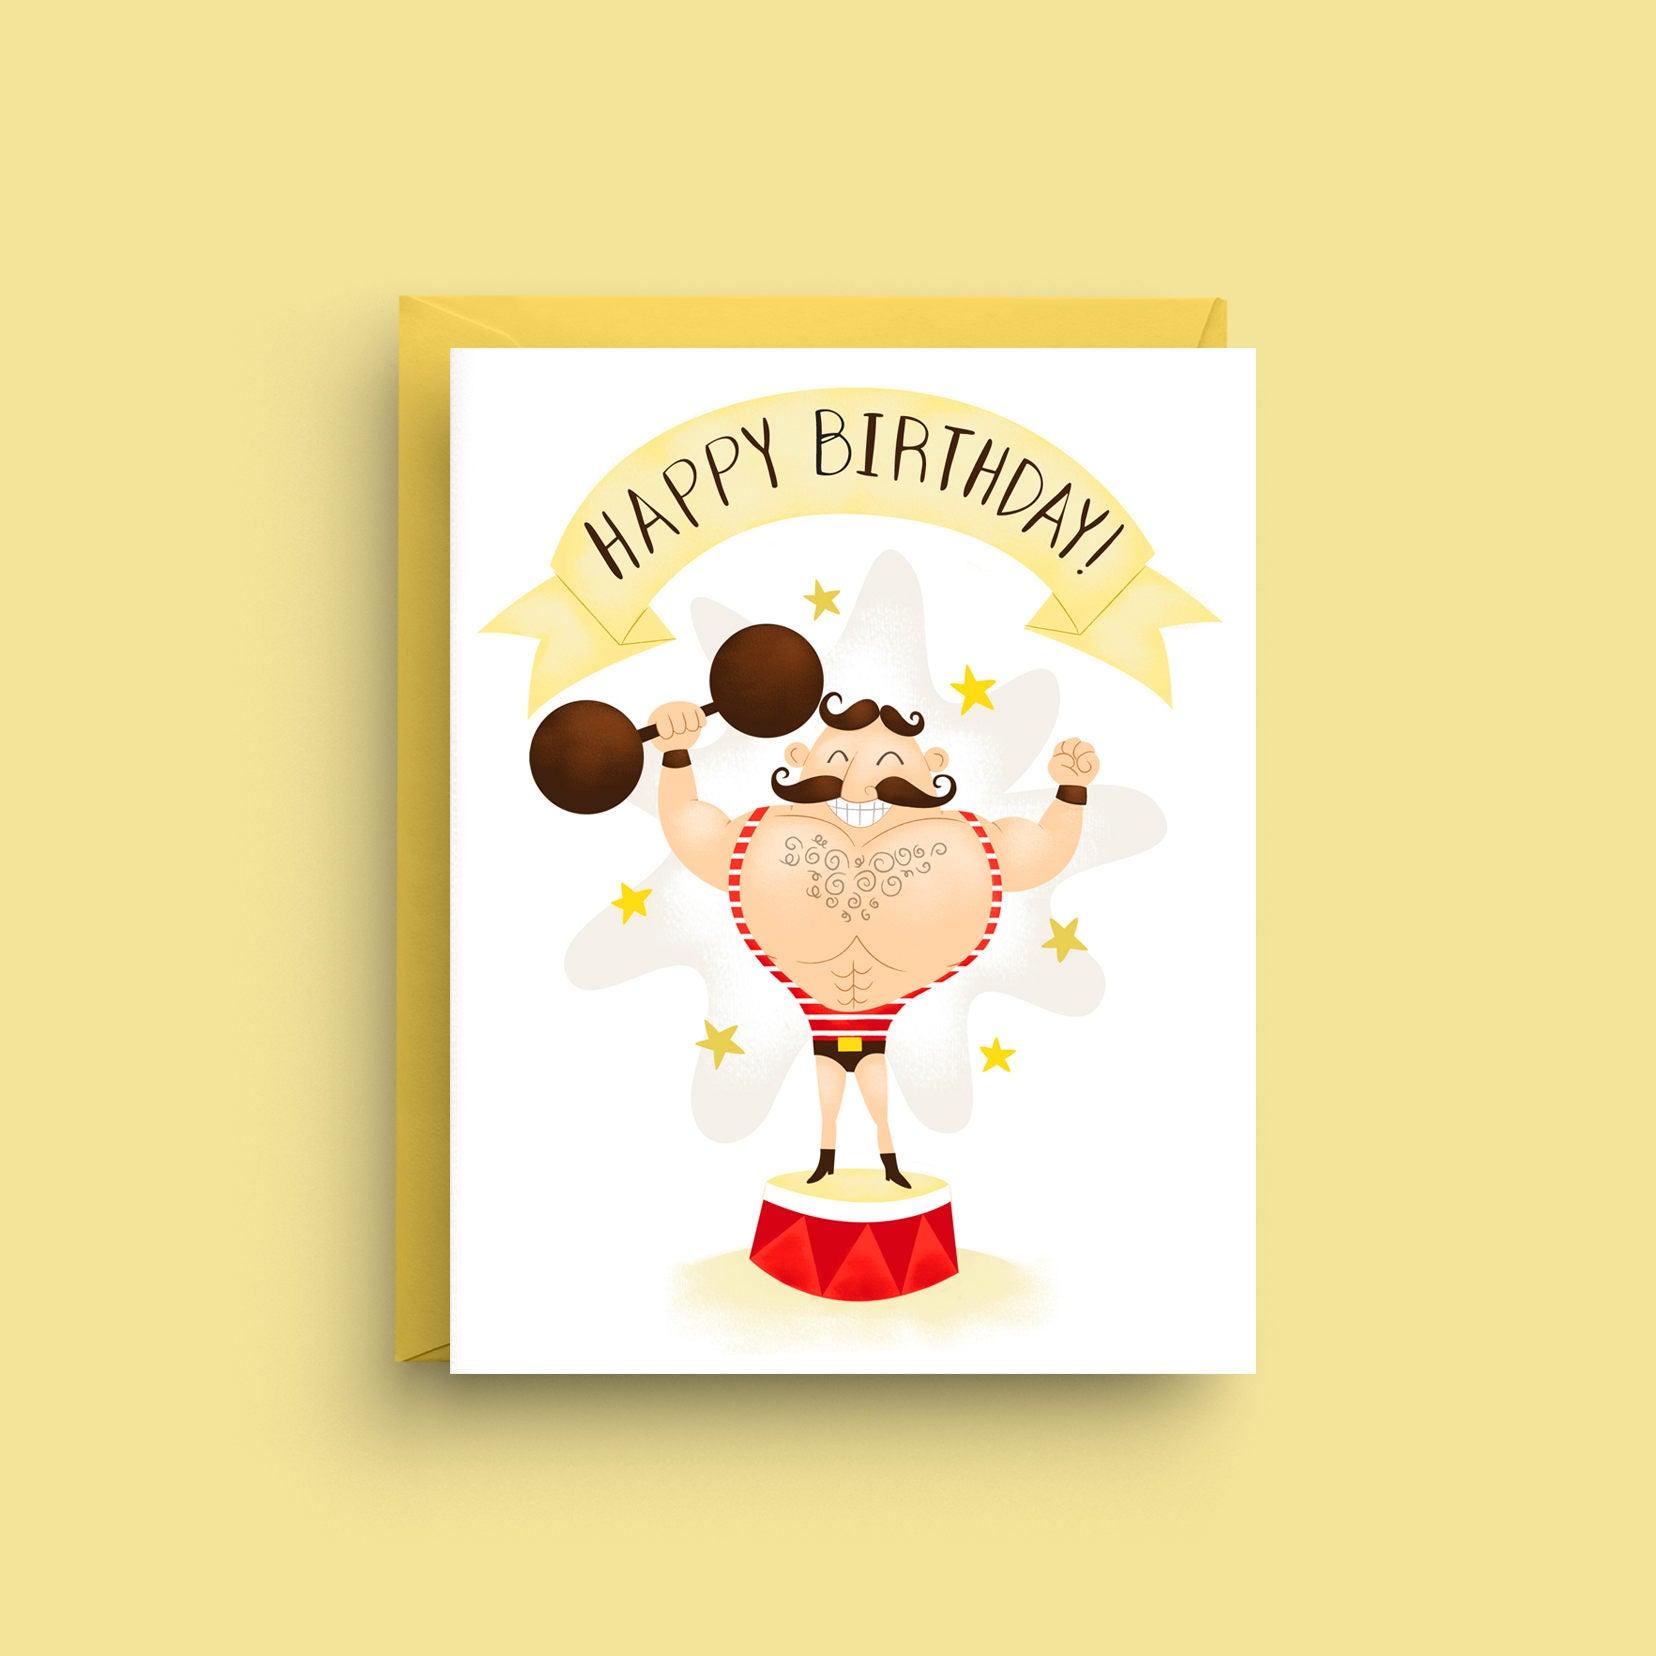 Happy Birthday Card Strong Man Card Funny Birthday Card